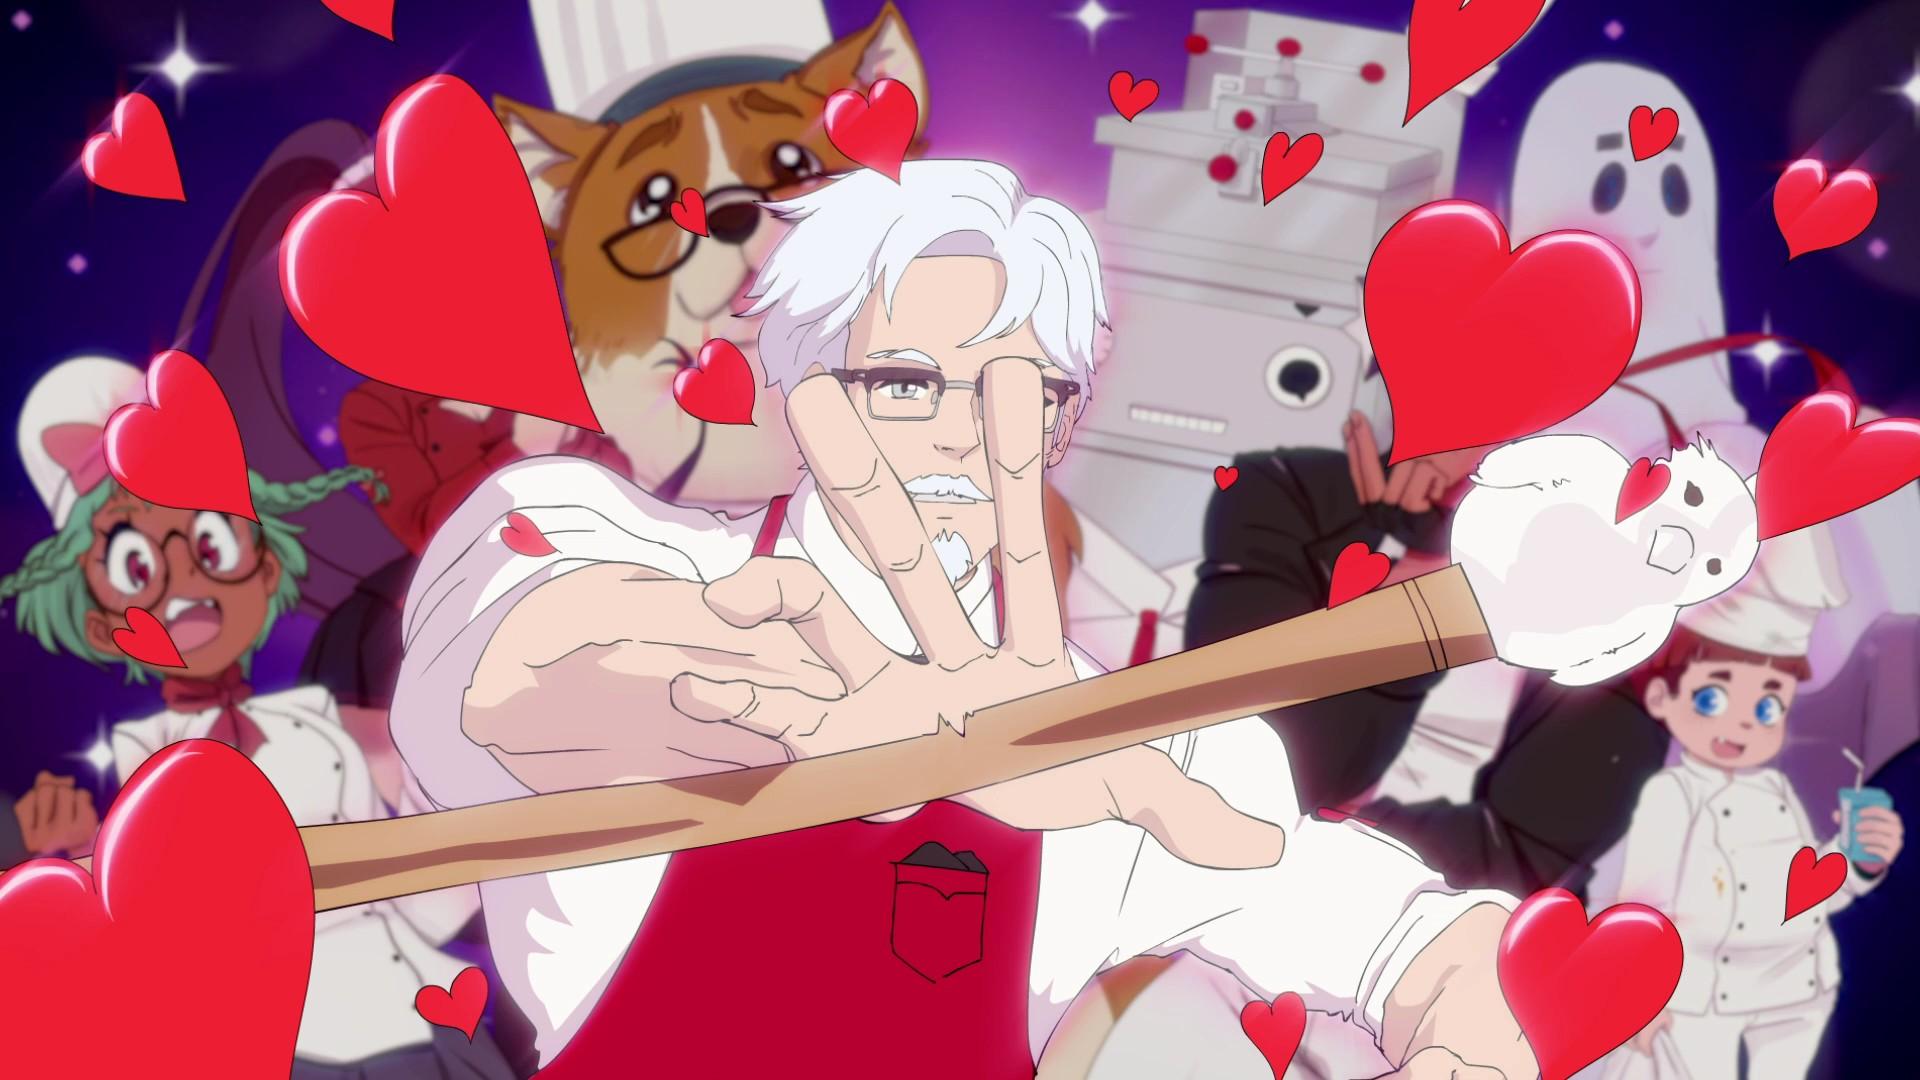 rolig japansk dating Sims matchmaking poäng